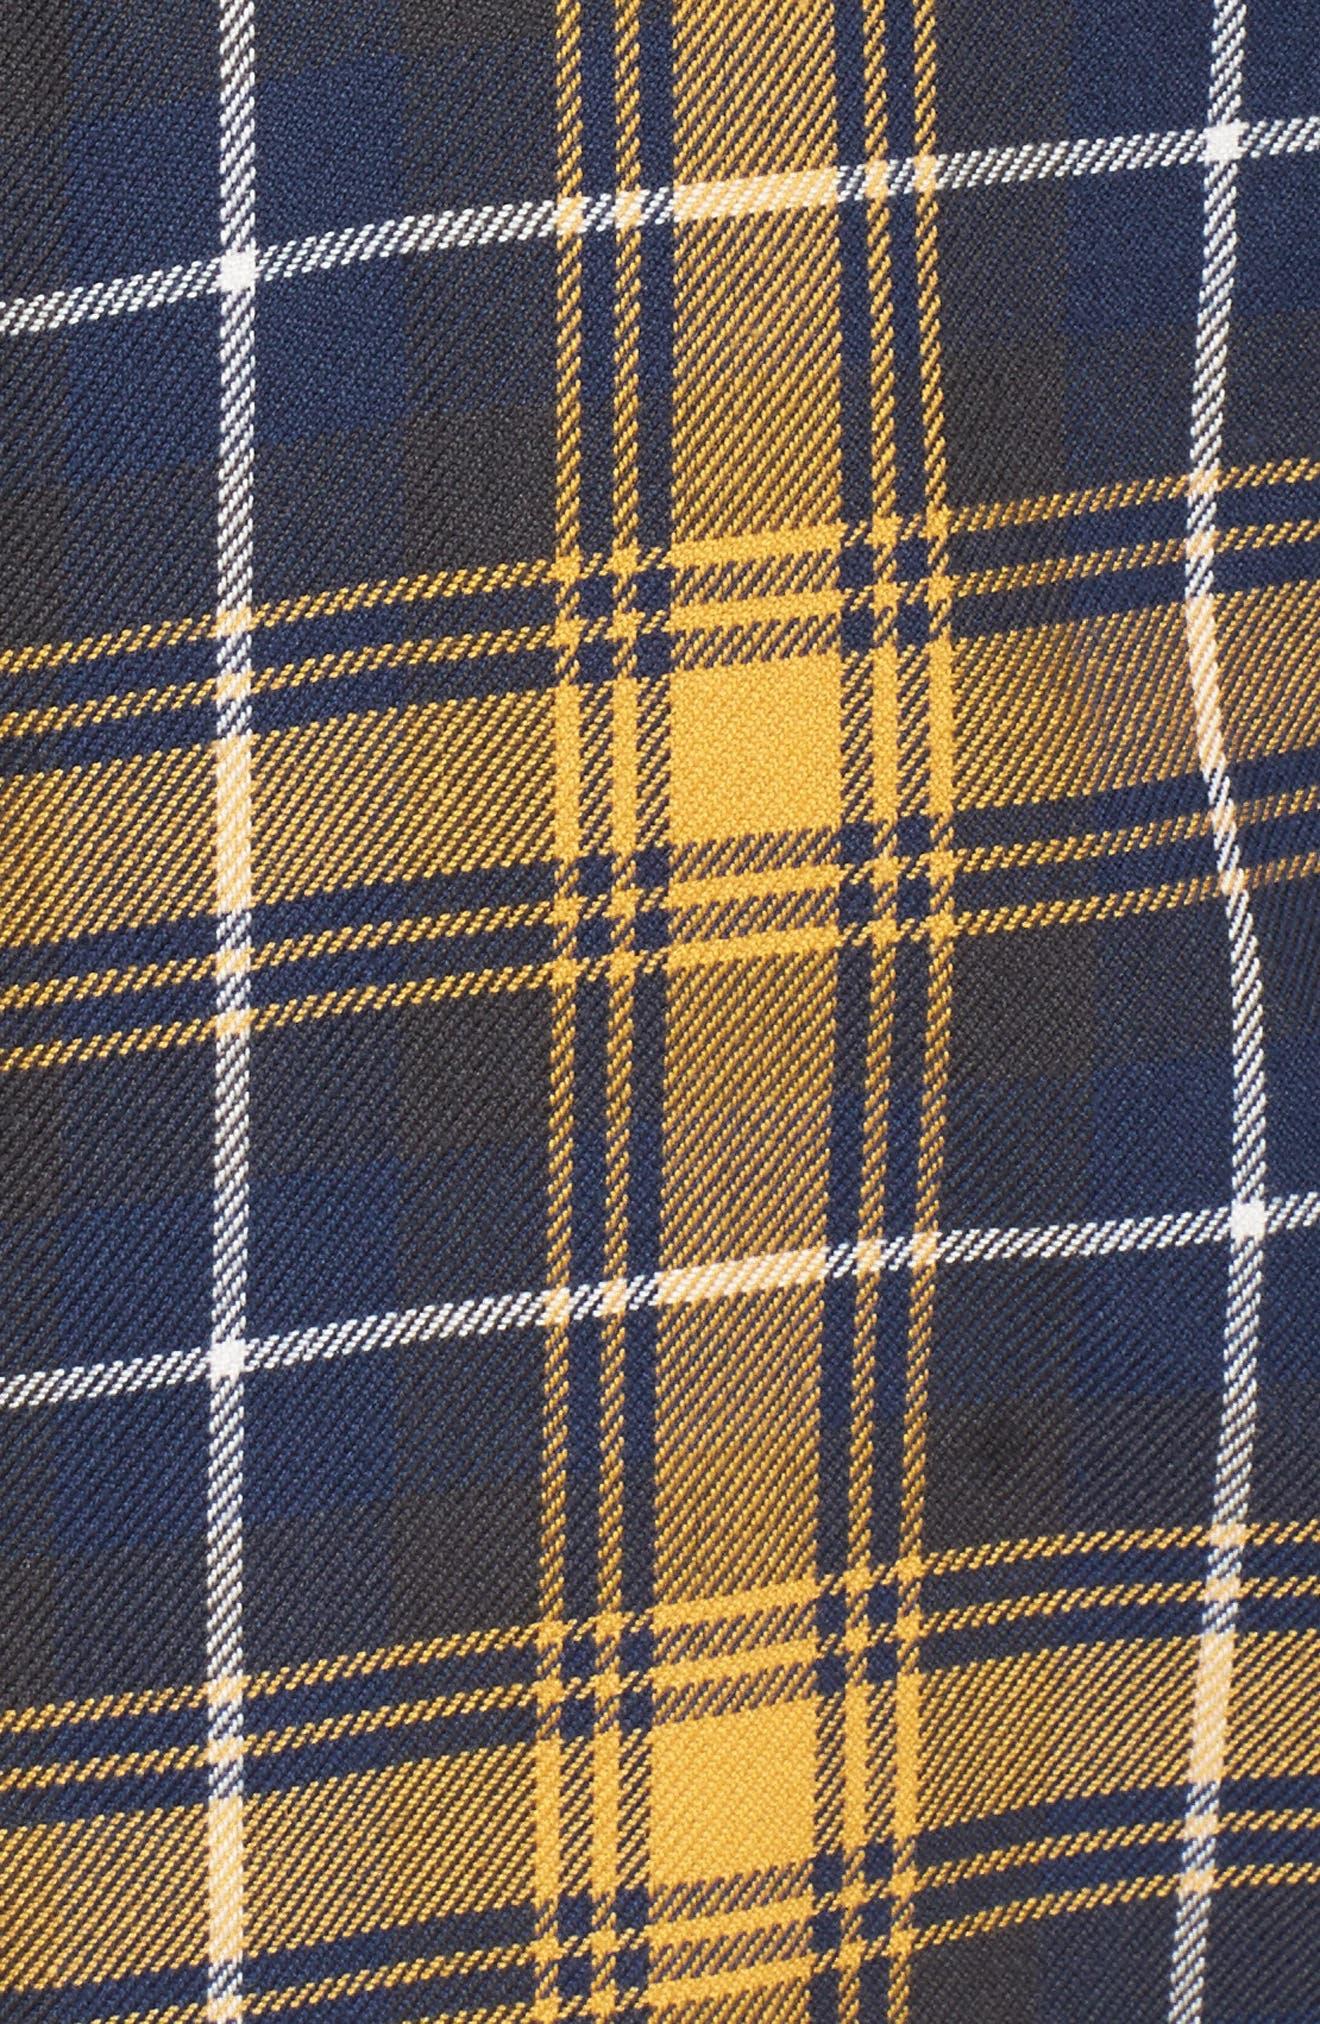 Sycamore Plaid Flannel Sport Shirt,                             Alternate thumbnail 5, color,                             720